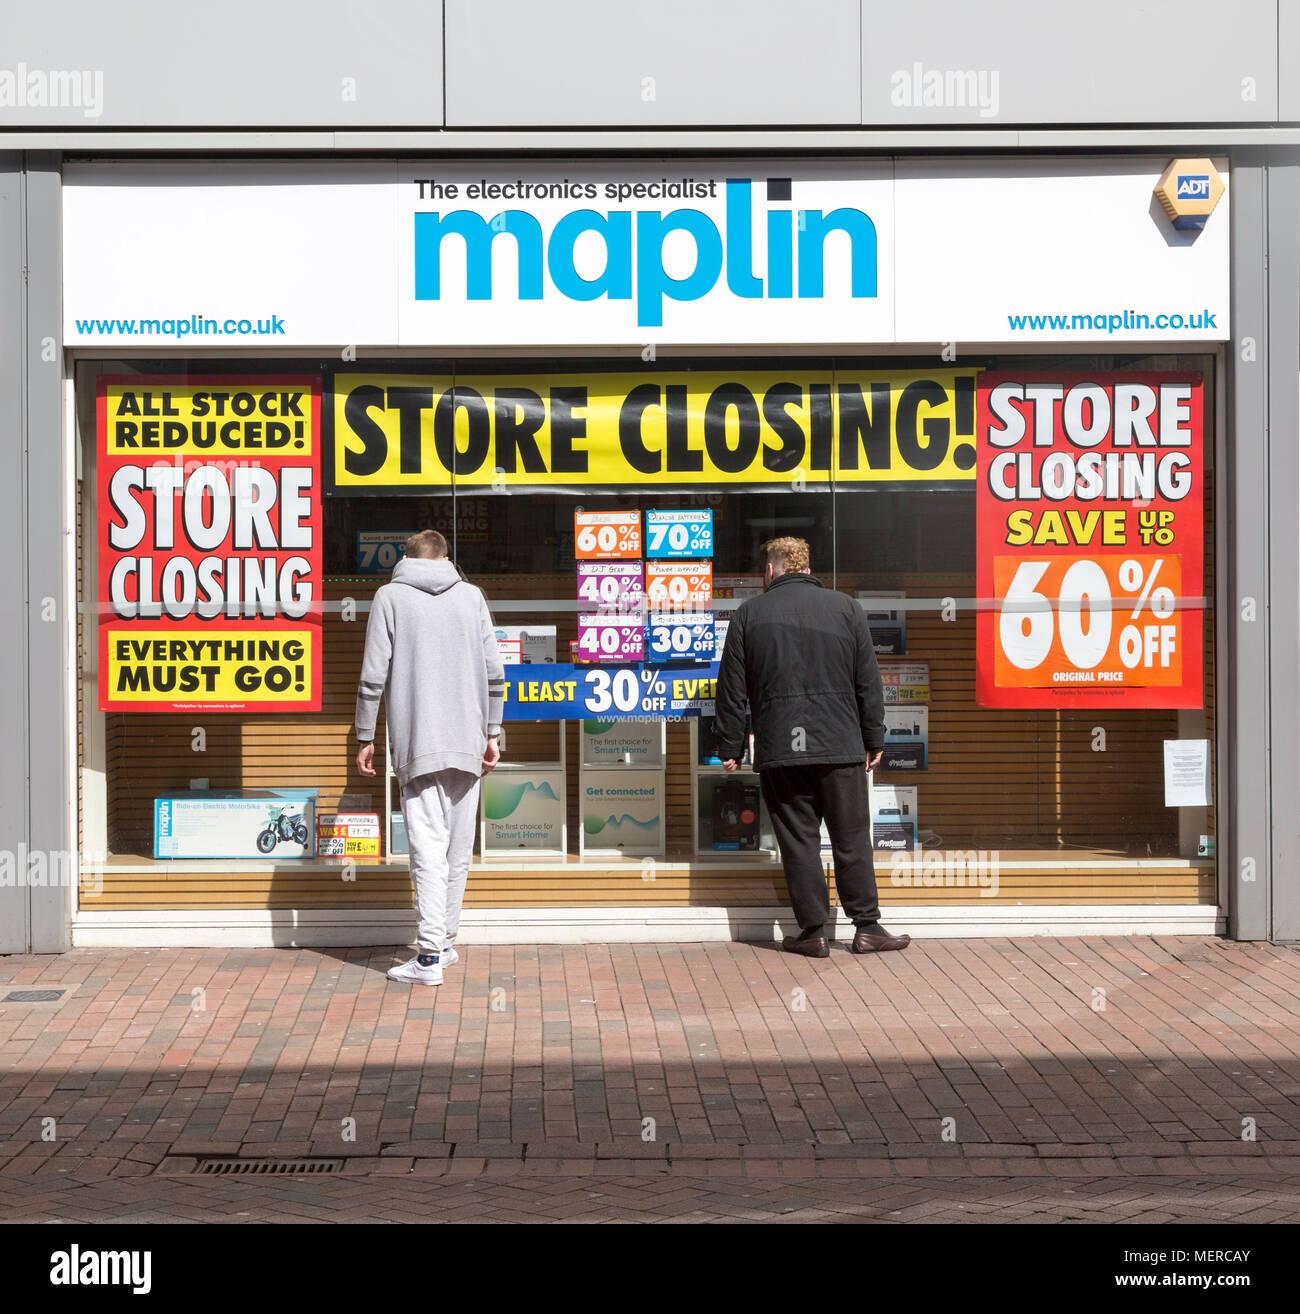 Maplin electronics specialist store closing High Street, Ipswich, Suffolk, England, UK - Stock Image